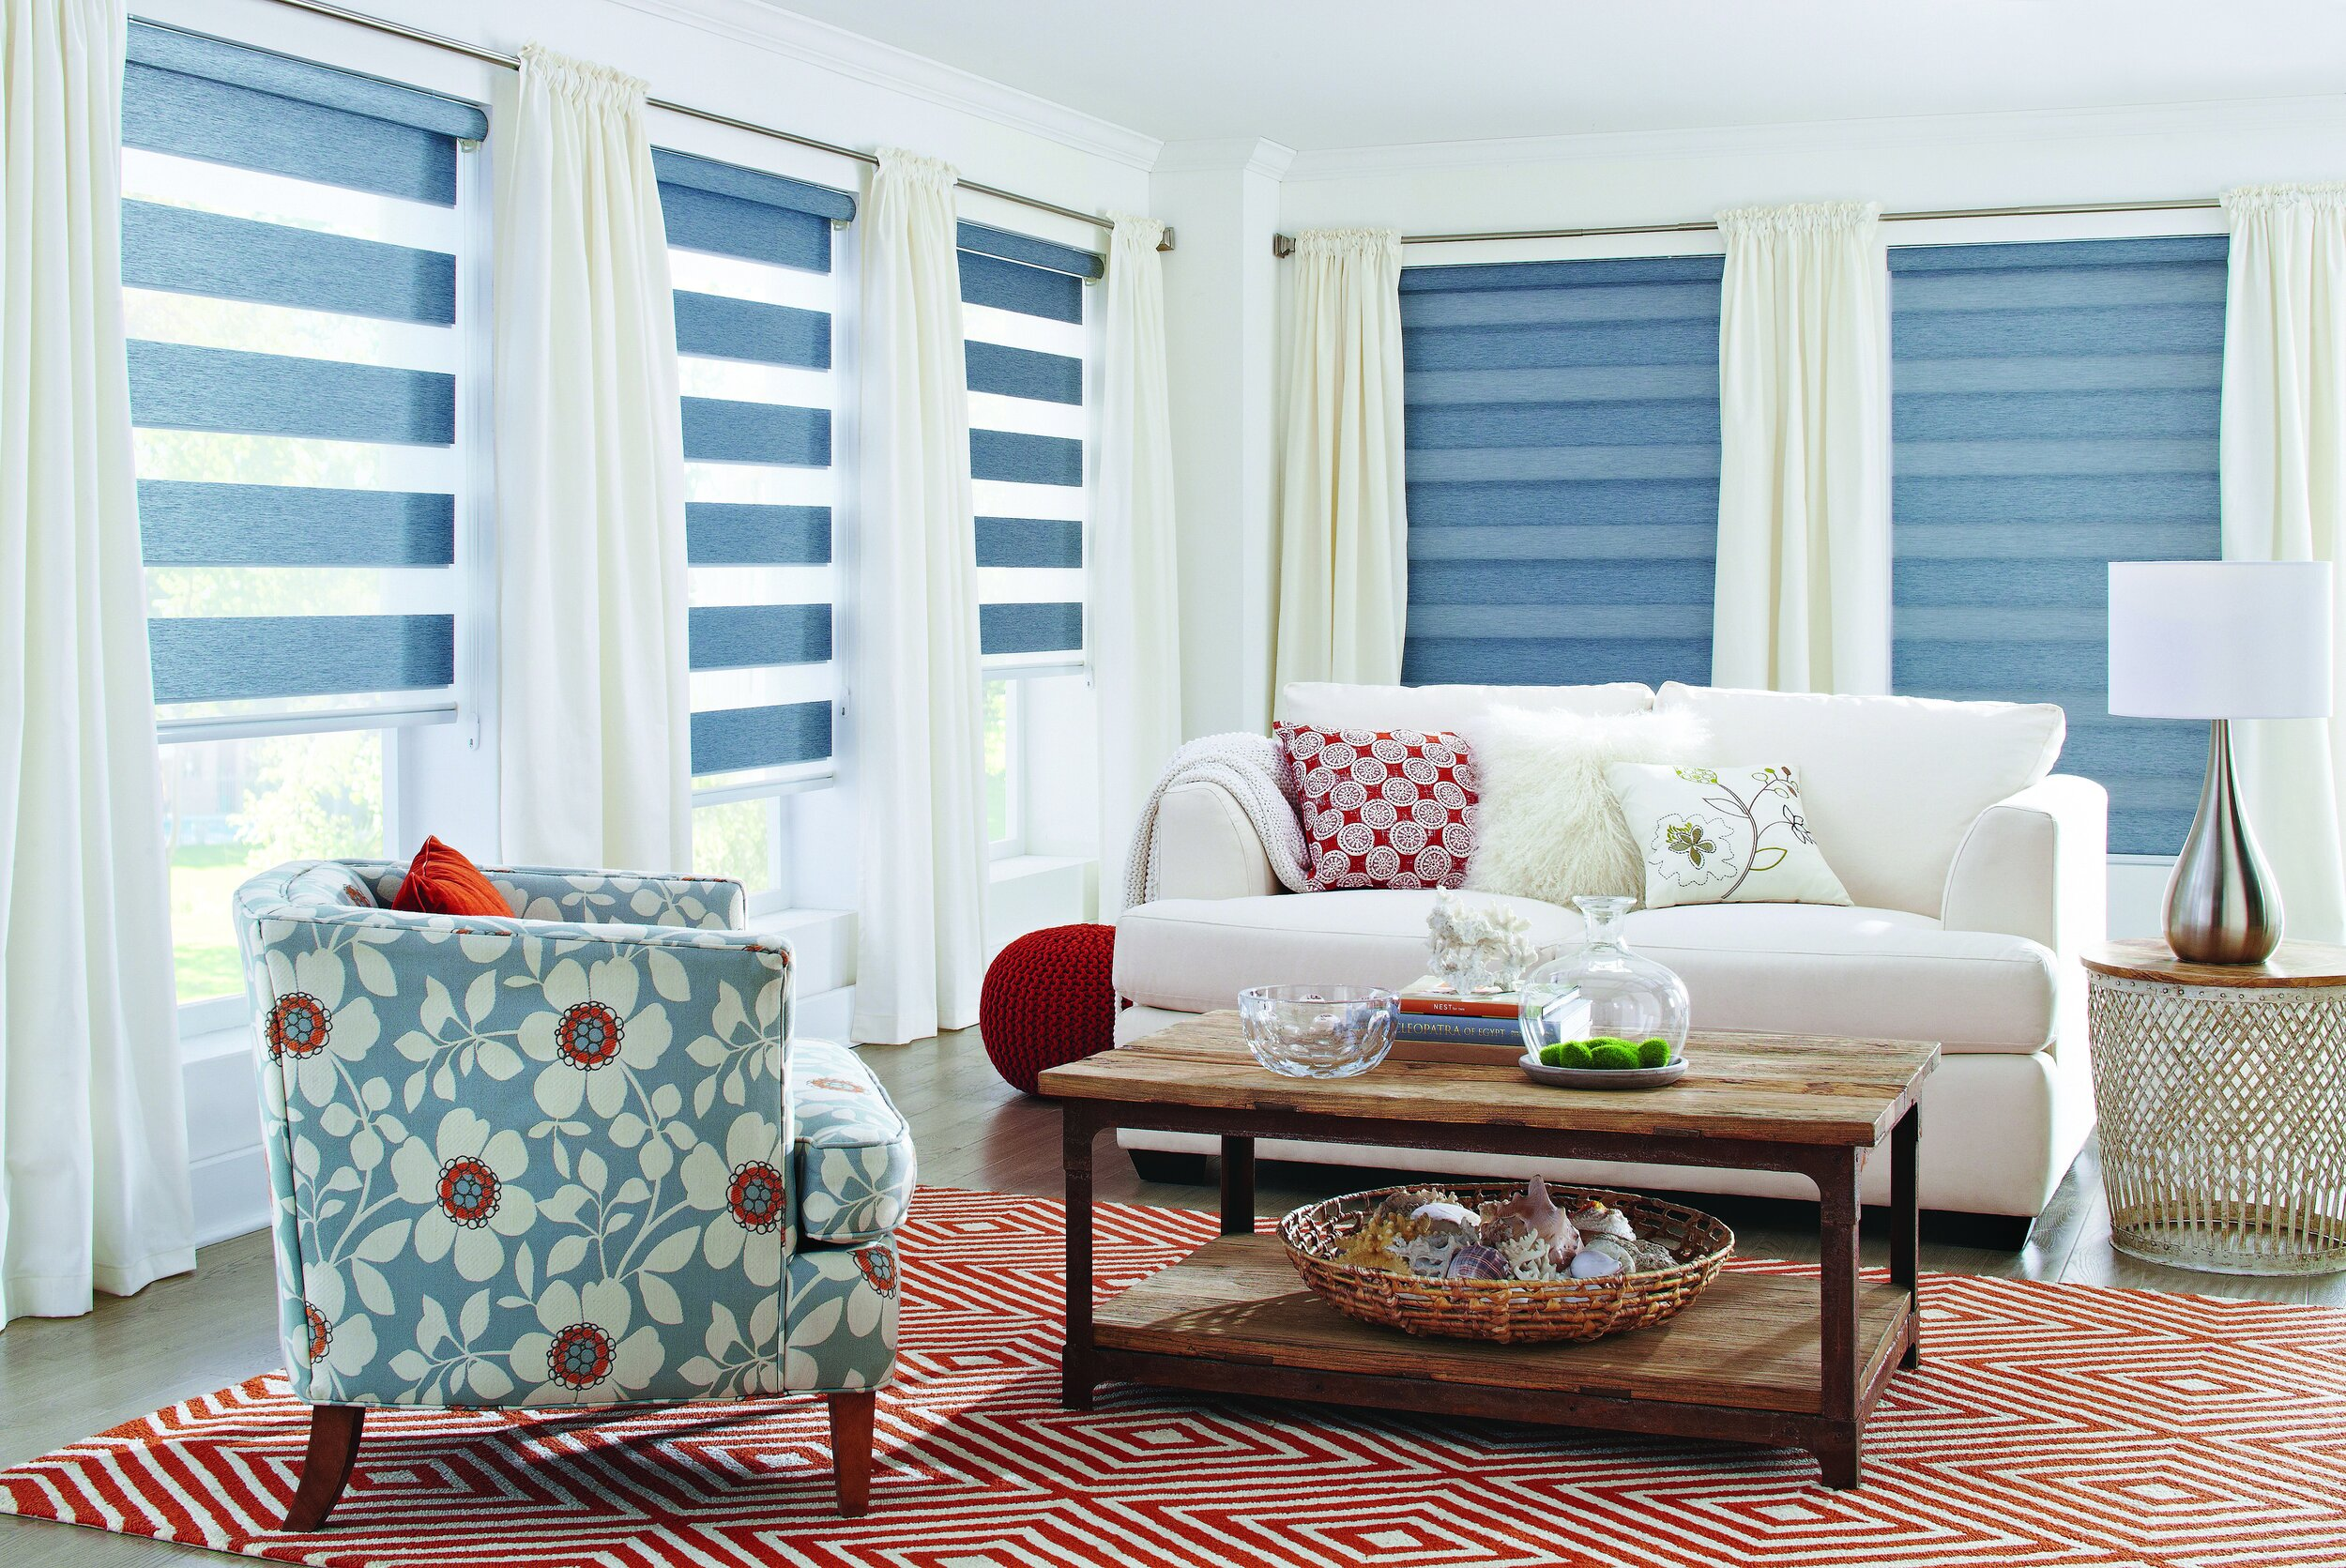 Custom Dual Shades — Villa Window Coverings